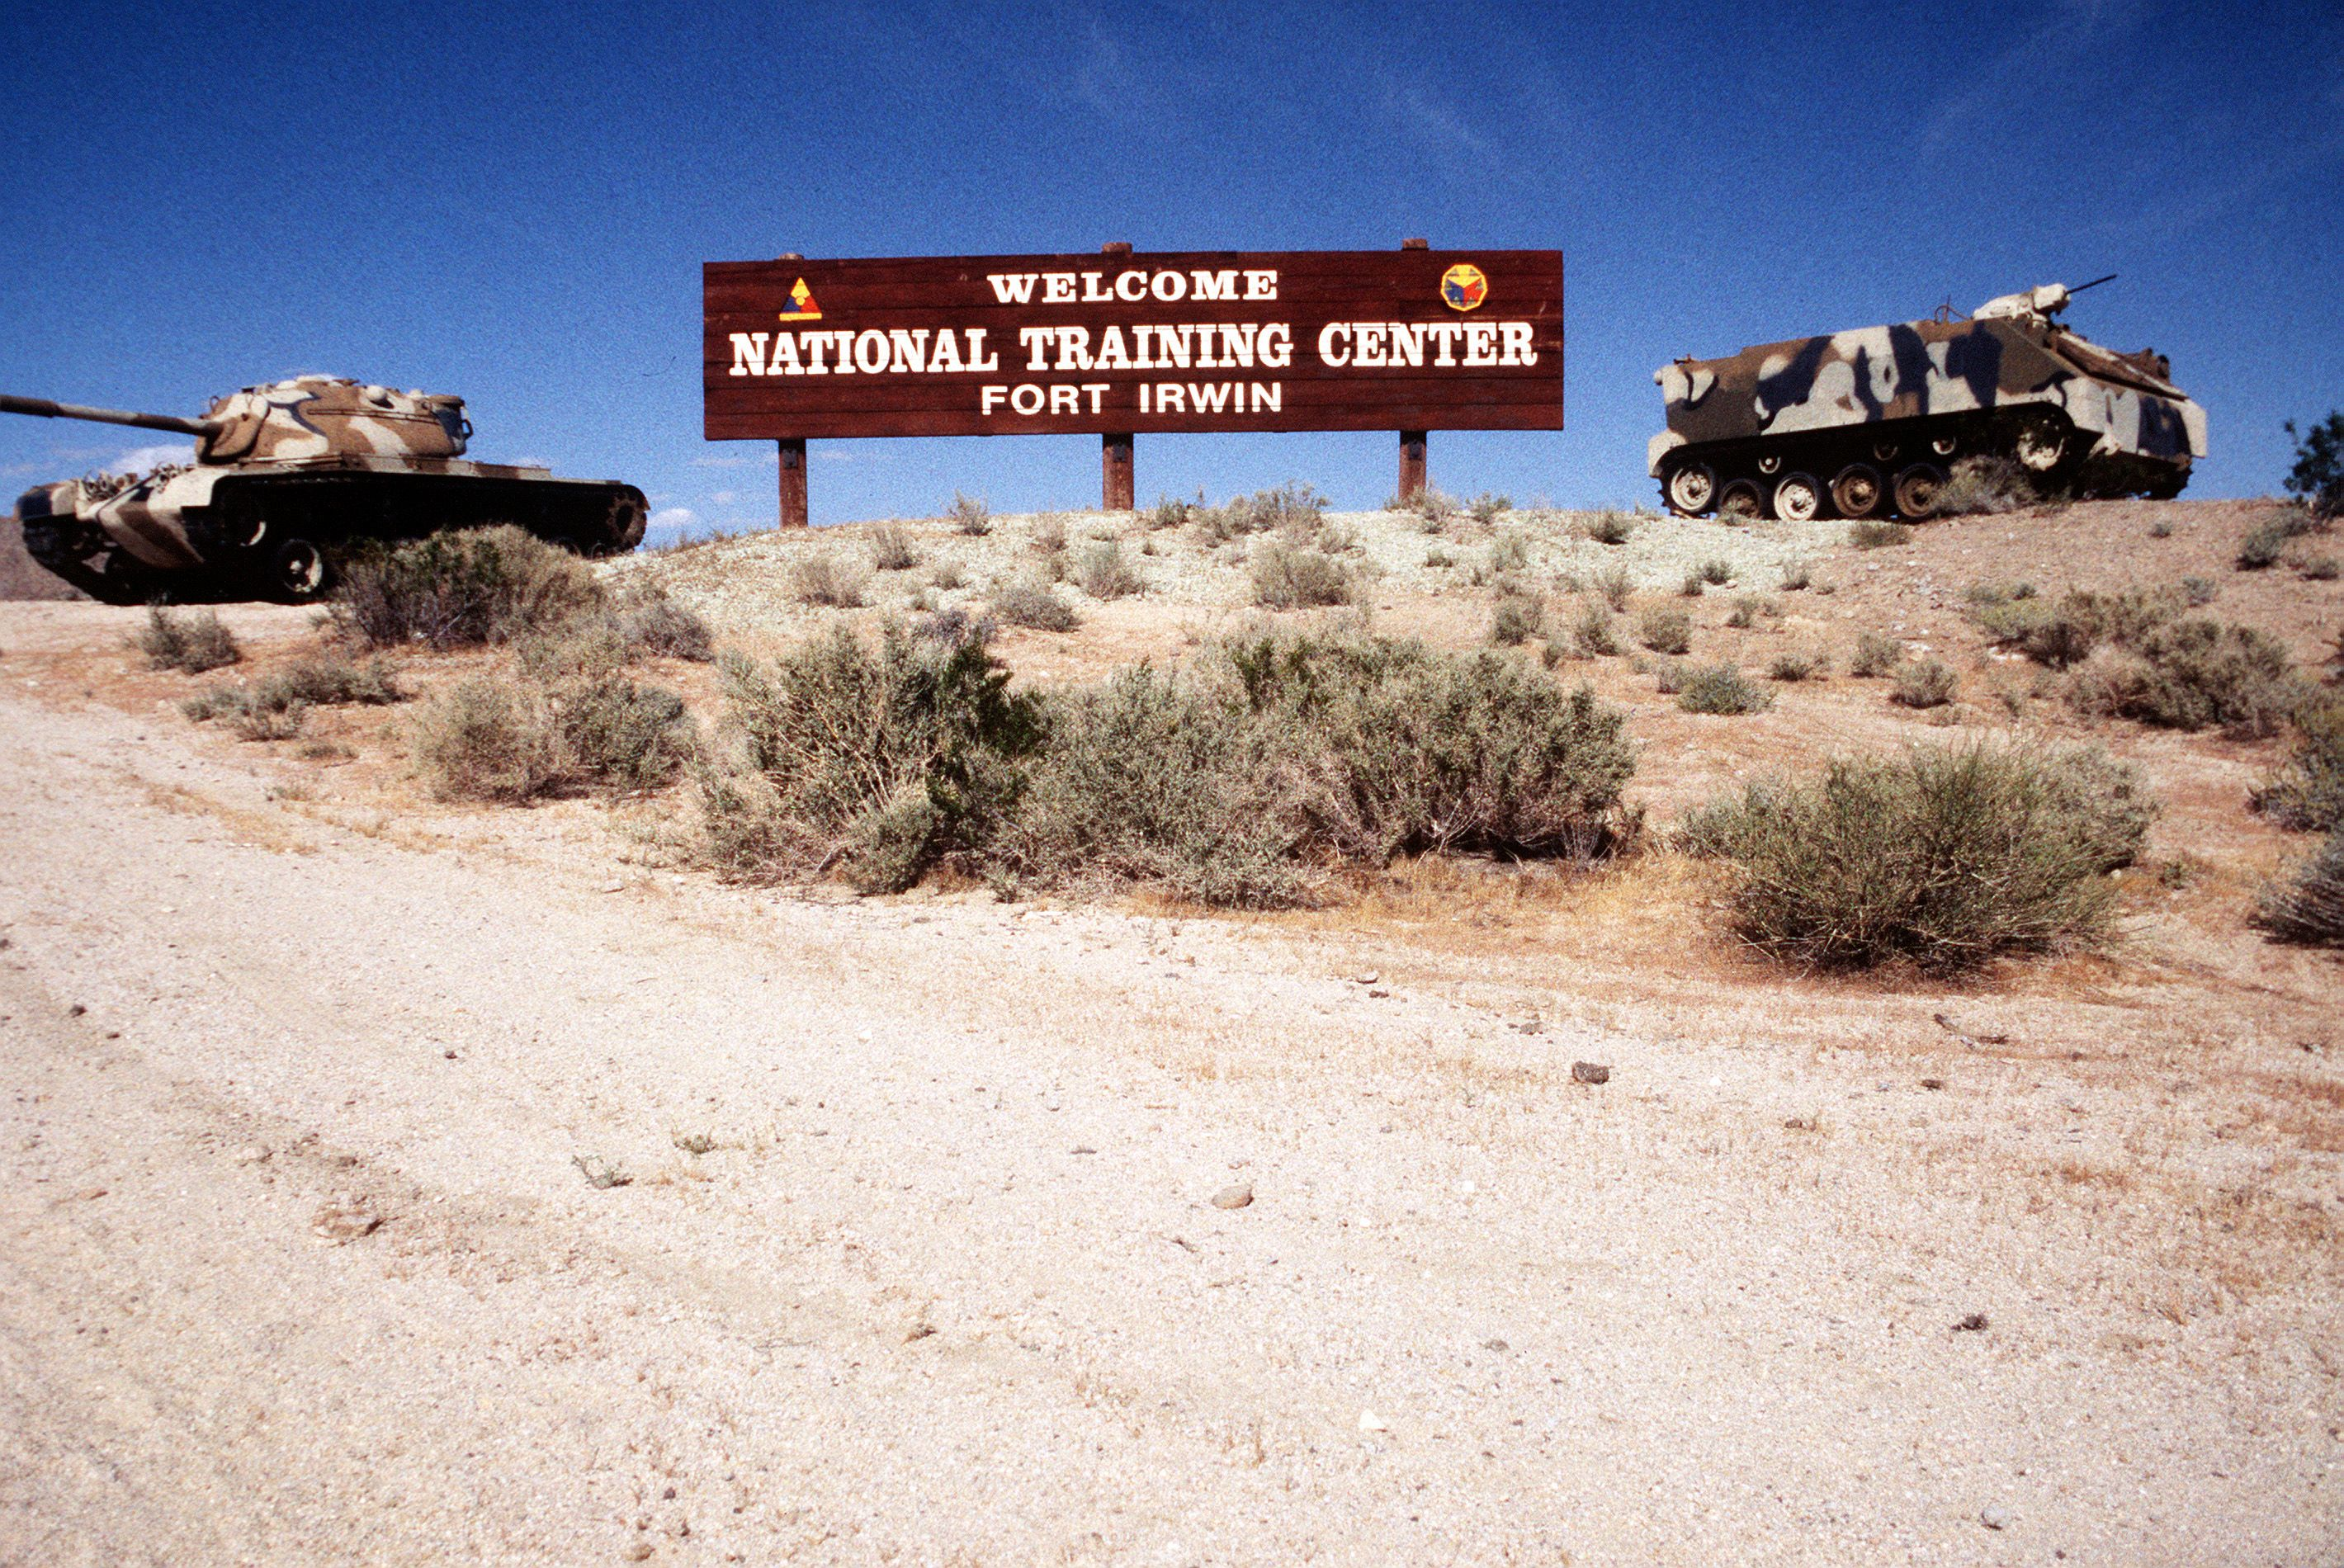 Fort irwin california national training center httpirwin fort irwin california home of the national training center located in the not so beautiful mohave desert publicscrutiny Gallery